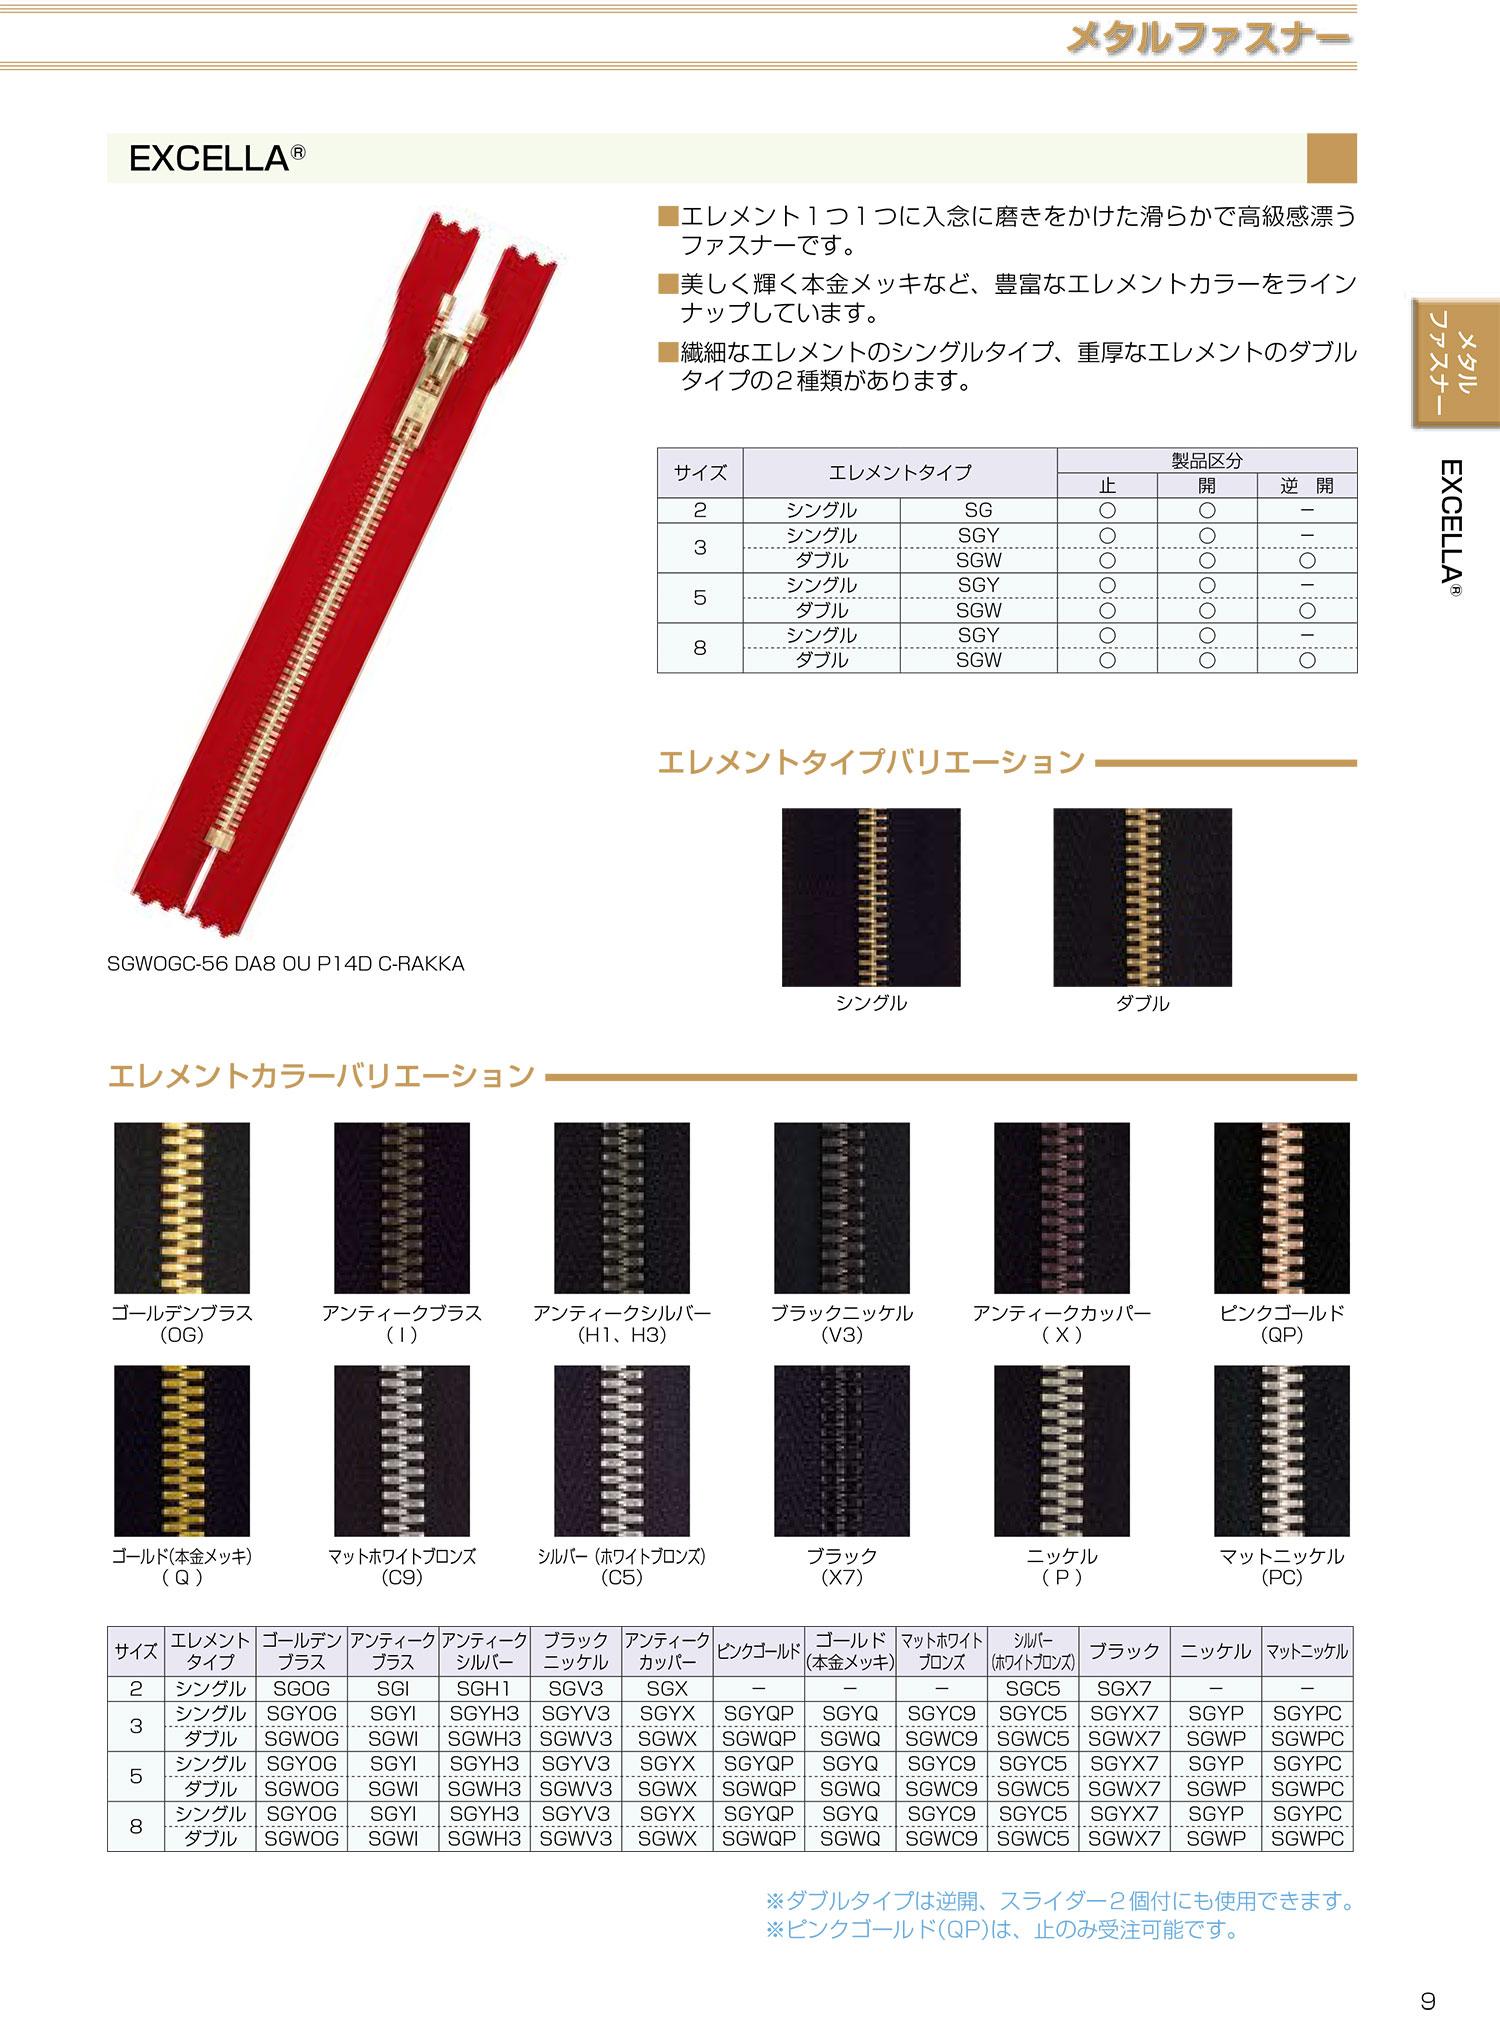 3SGYC9OR エクセラ 3サイズ マットホワイトブロンズ オープン シングル[ファスナー] YKK/オークラ商事 - ApparelX アパレル資材卸通販